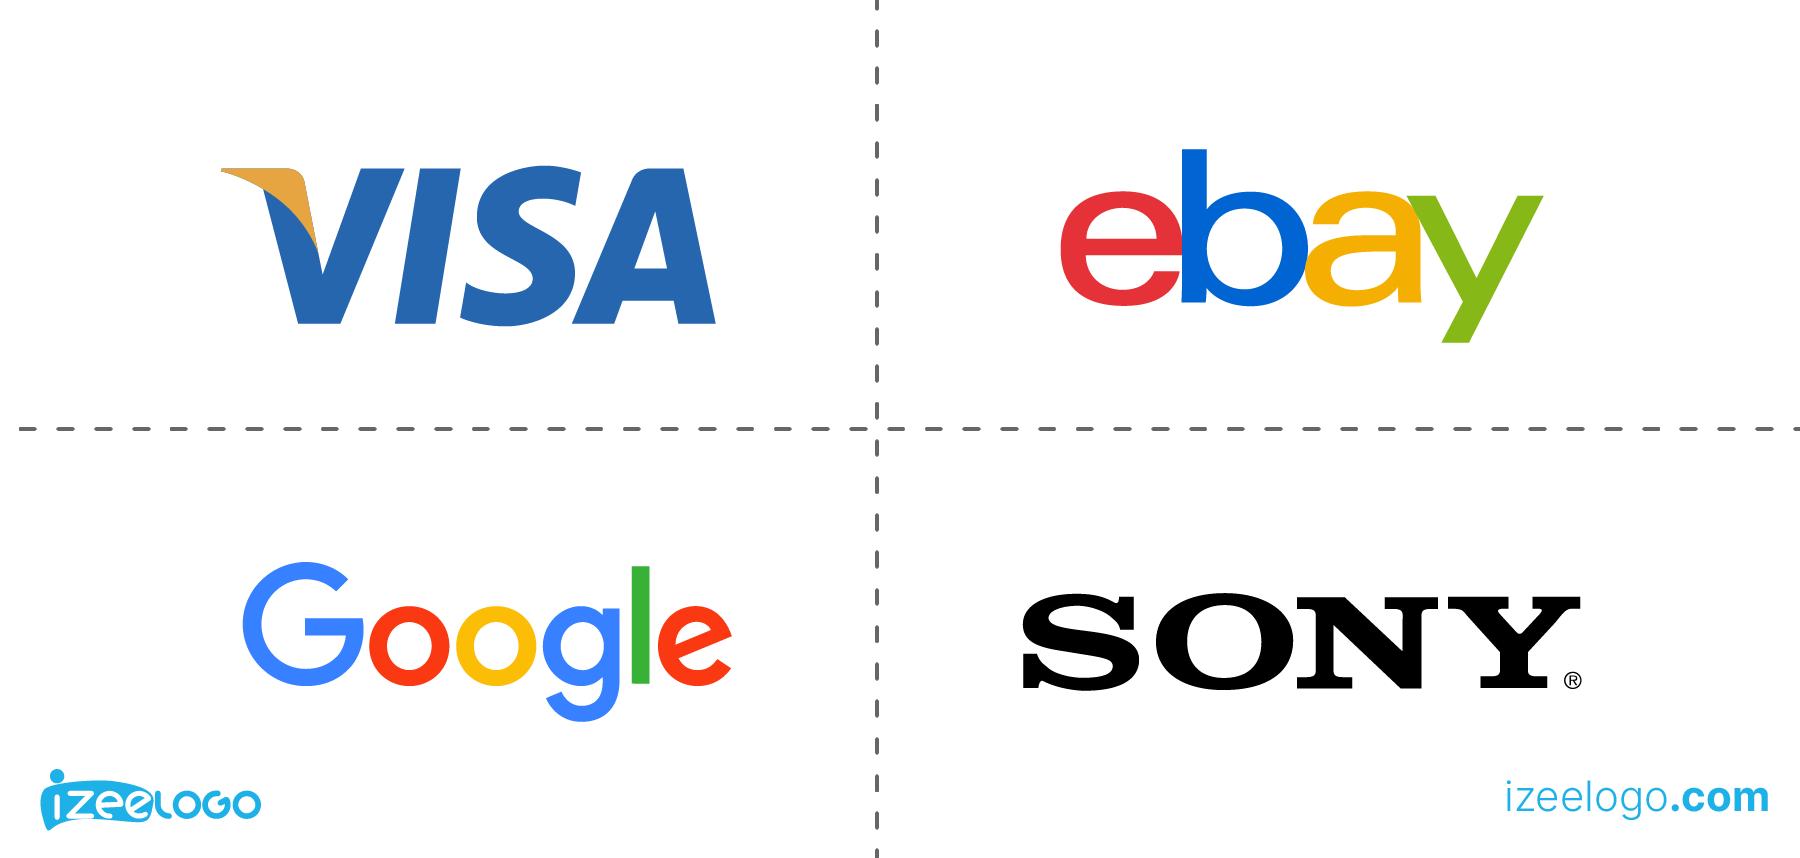 Exemples de logo mot-symbole : logo Google PNG, logo Visa PNG, logo eBay PNG et logo Sony PNG.